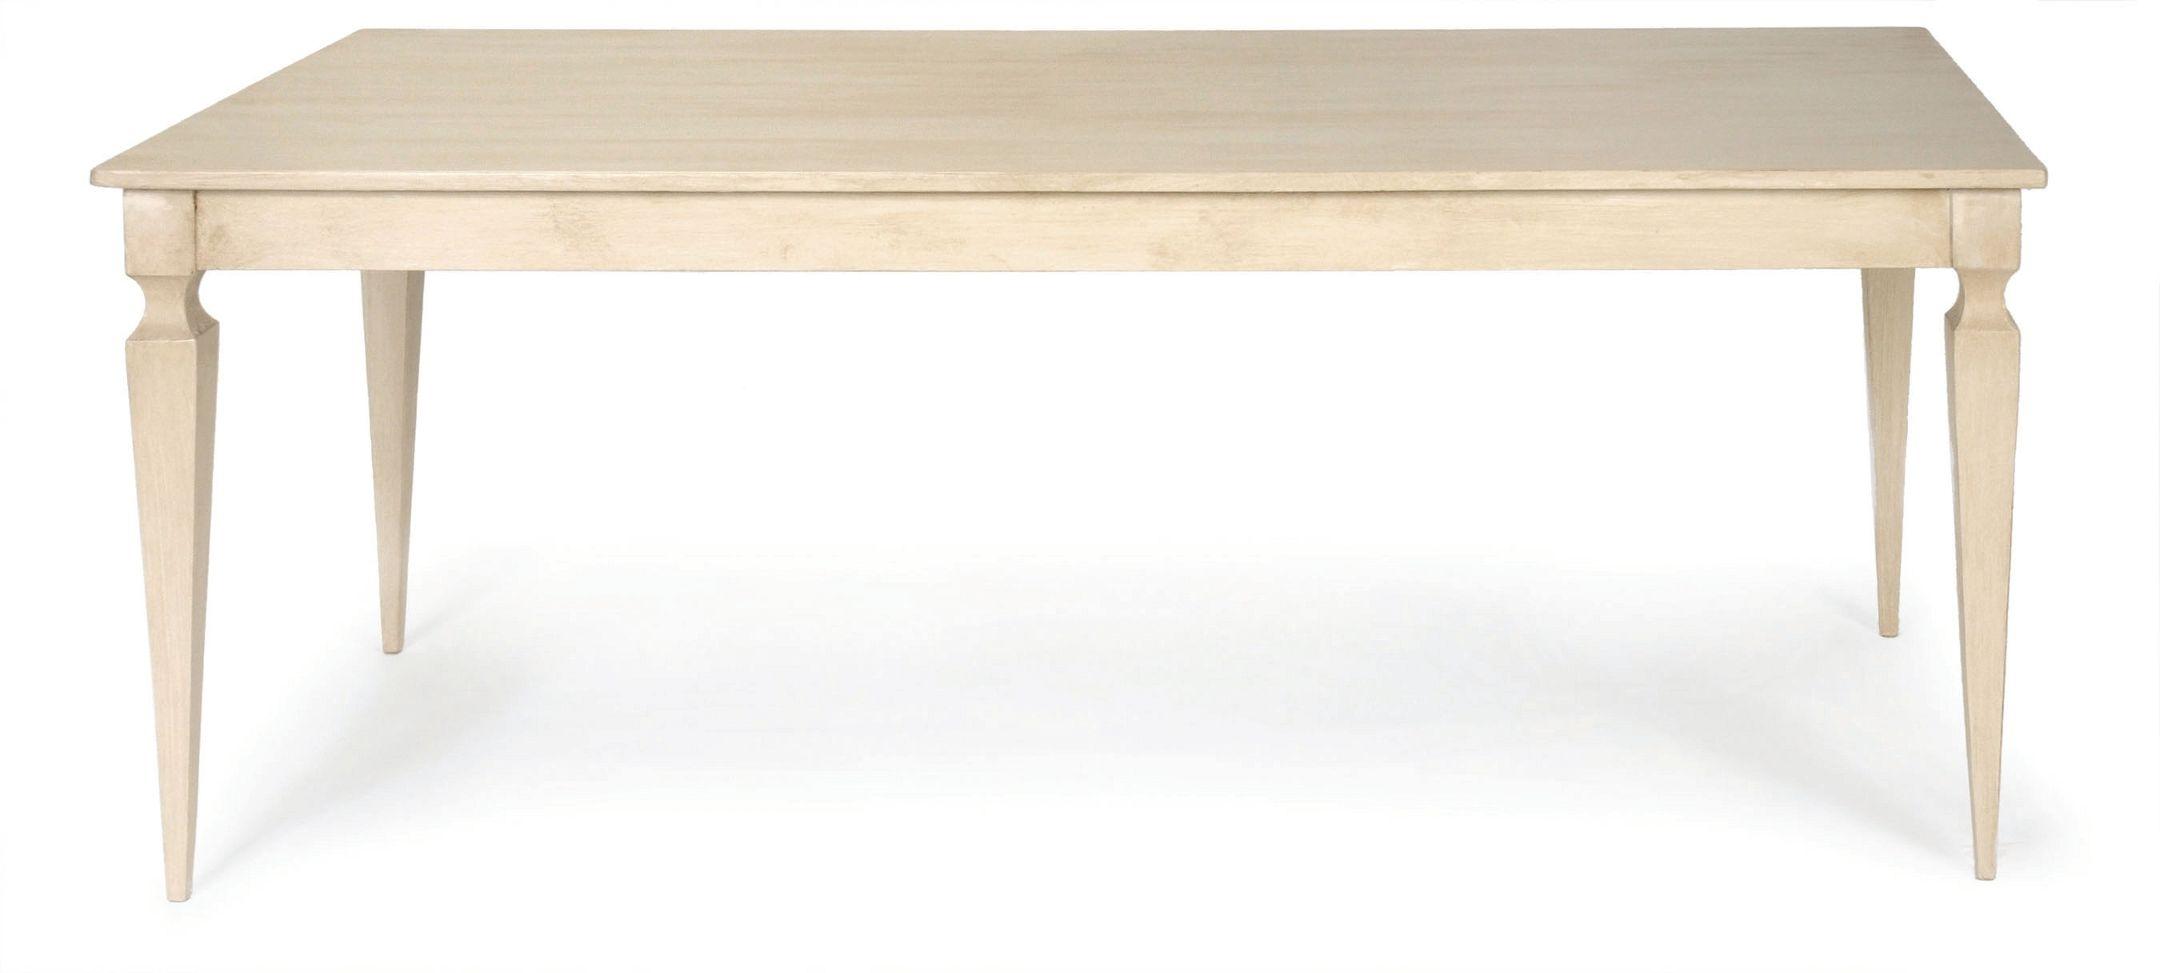 Terrific Directoire Dining Table Dimensions 30H X 38D Custom Lamtechconsult Wood Chair Design Ideas Lamtechconsultcom